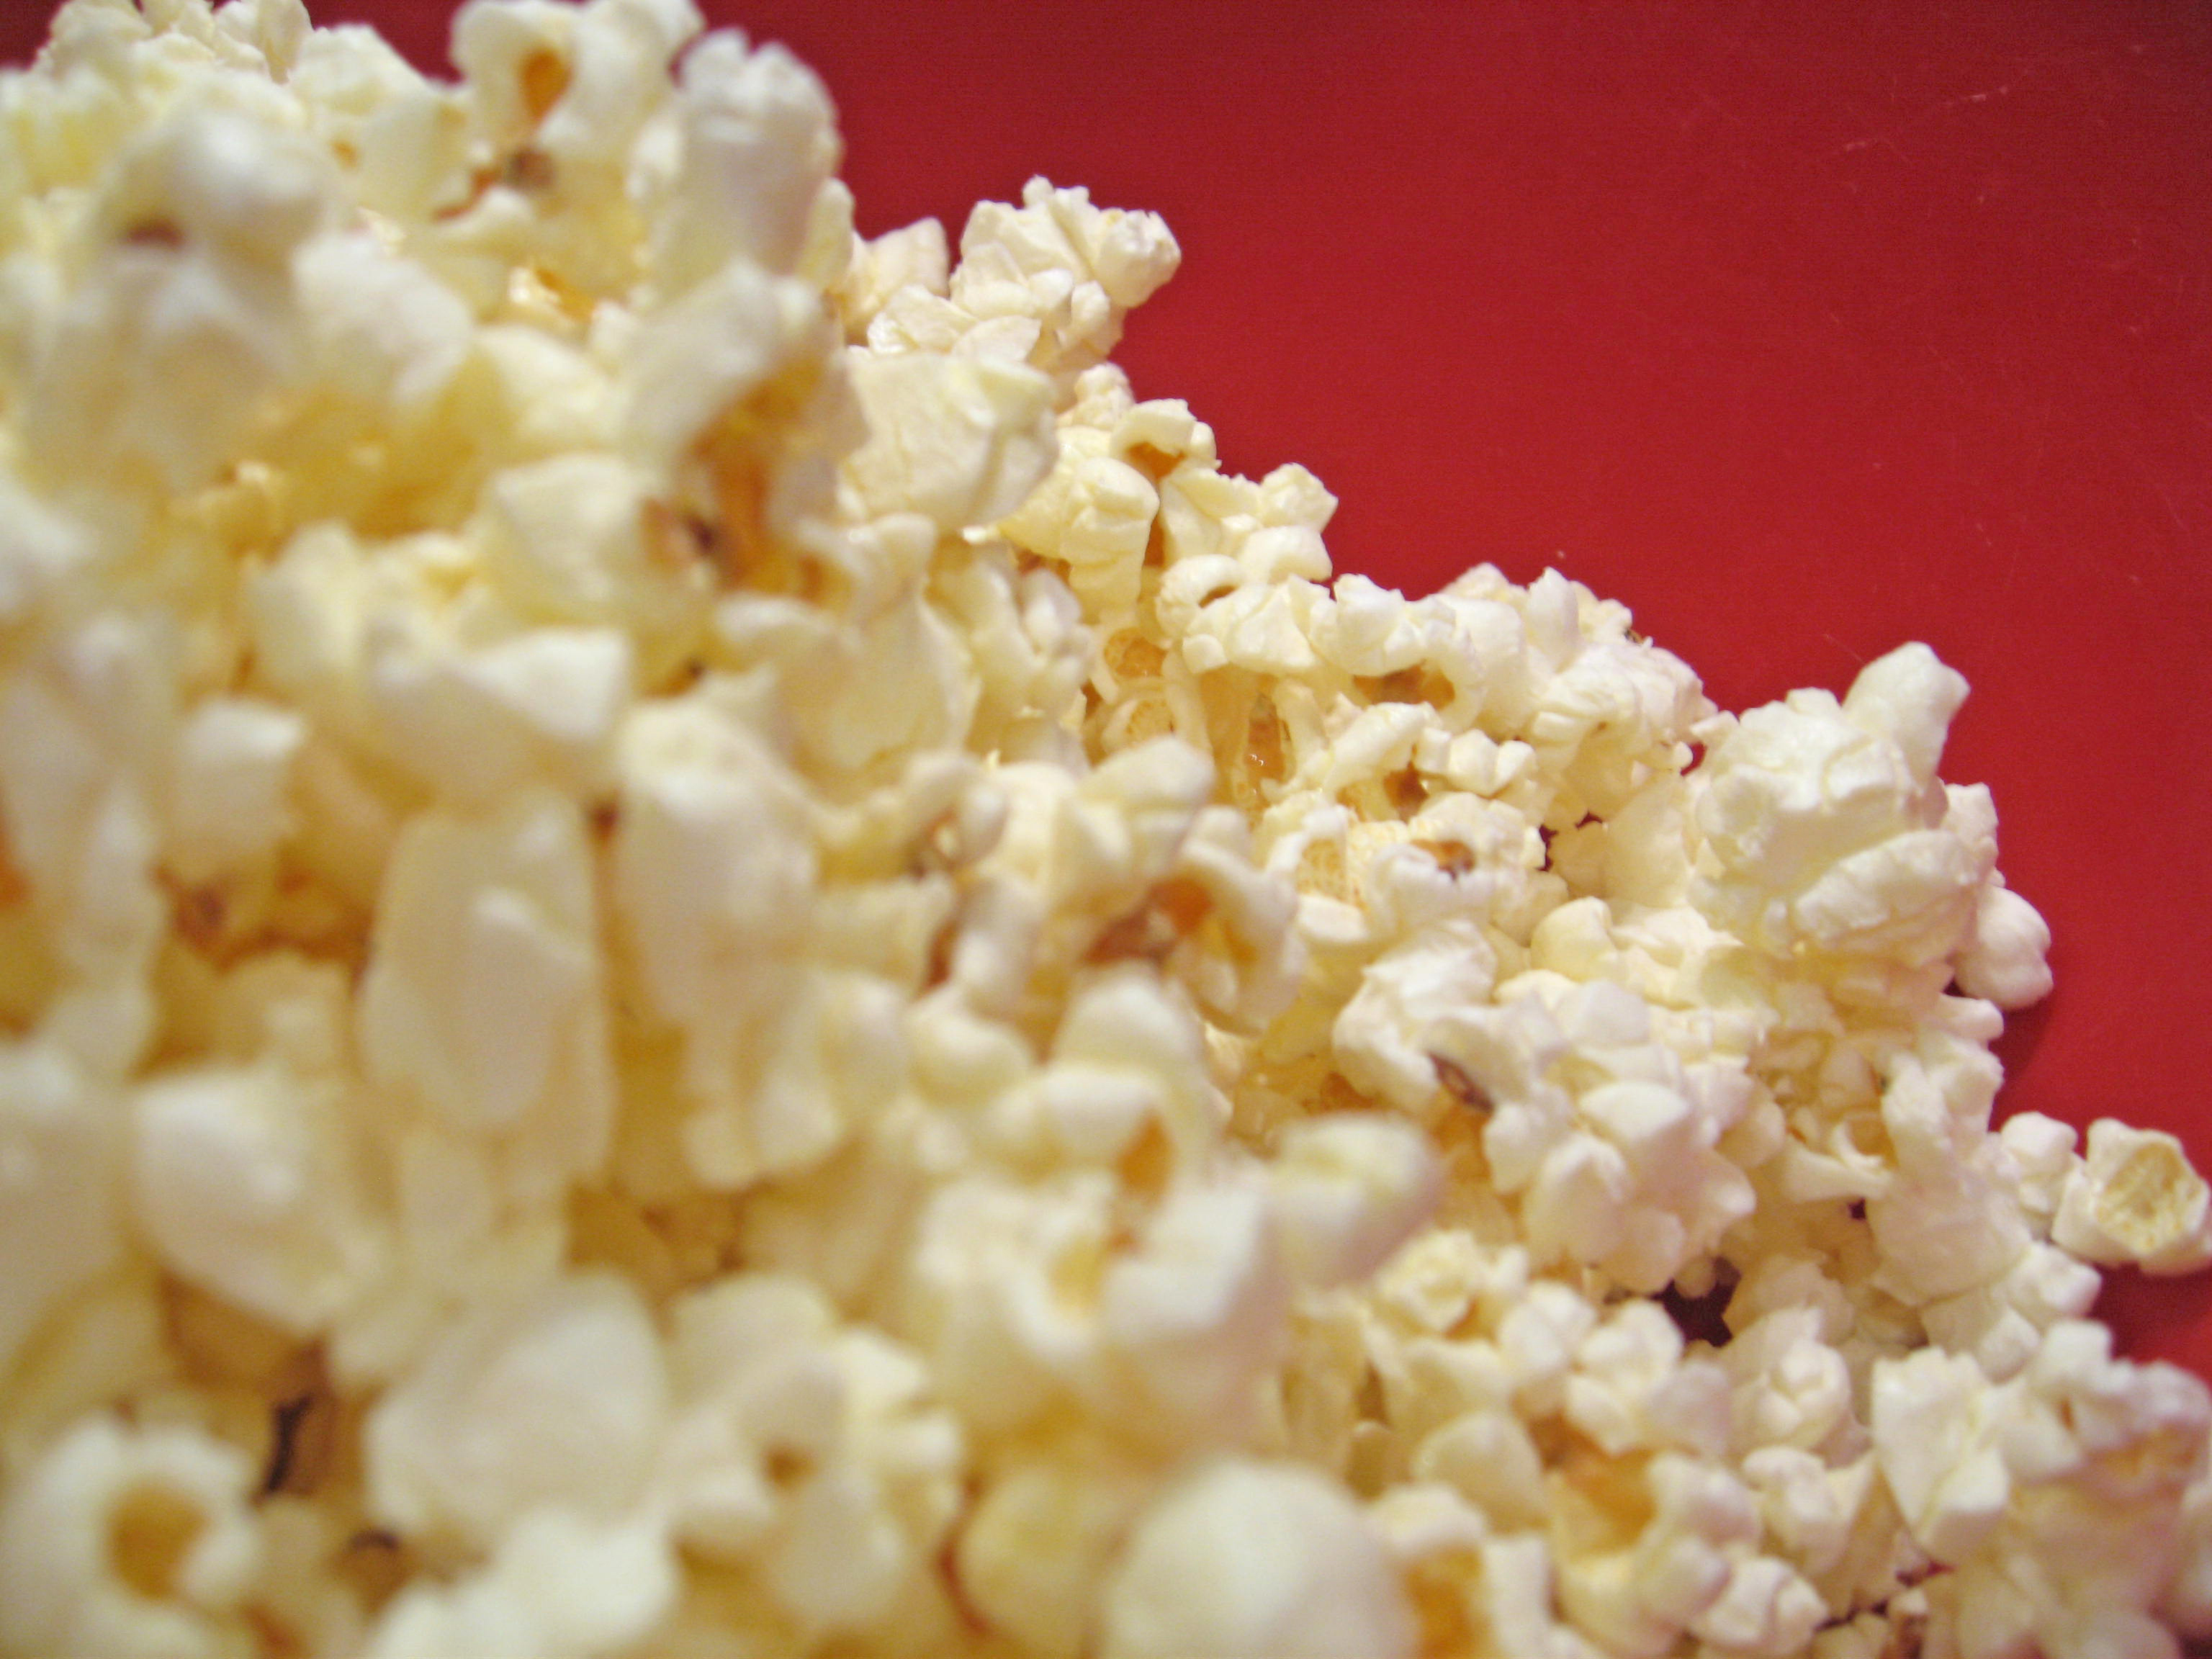 Popcorn HD Wallpaper | Background Image | 3072x2304 | ID ...